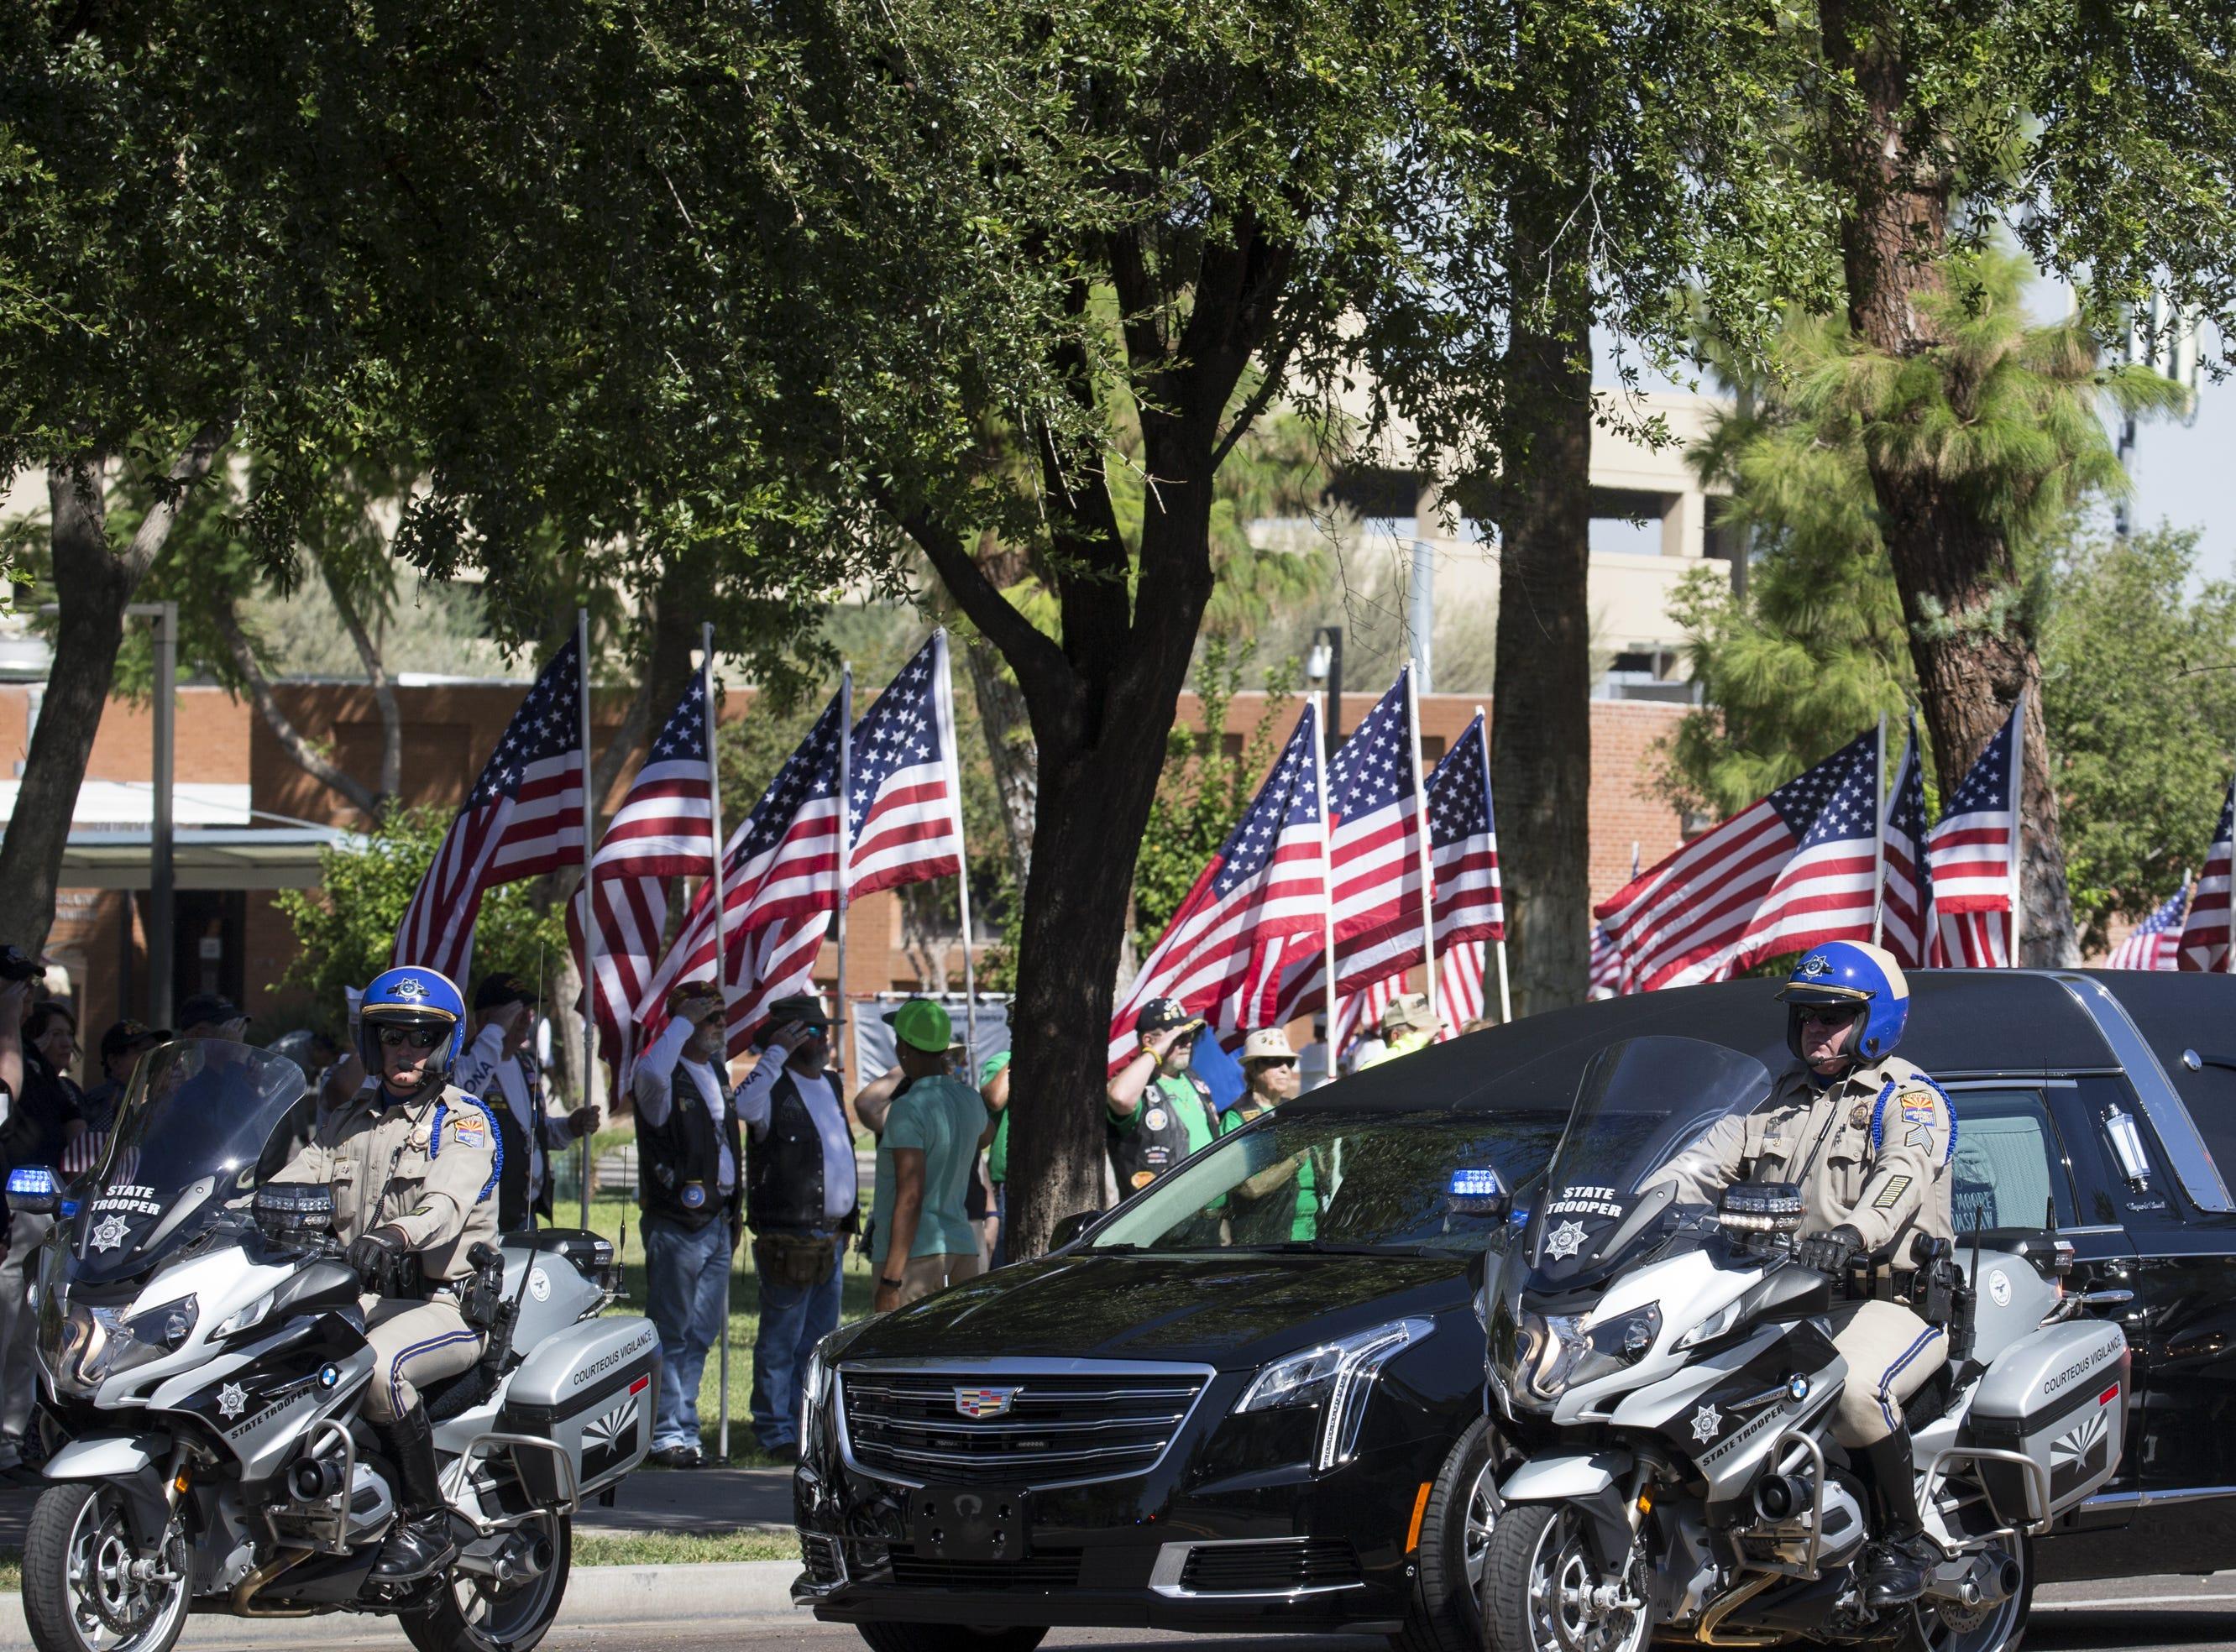 The motorcade arrives at the Arizona State Capitol for the John McCain Memorial Service, August 29, 2018, Phoenix, Arizona.